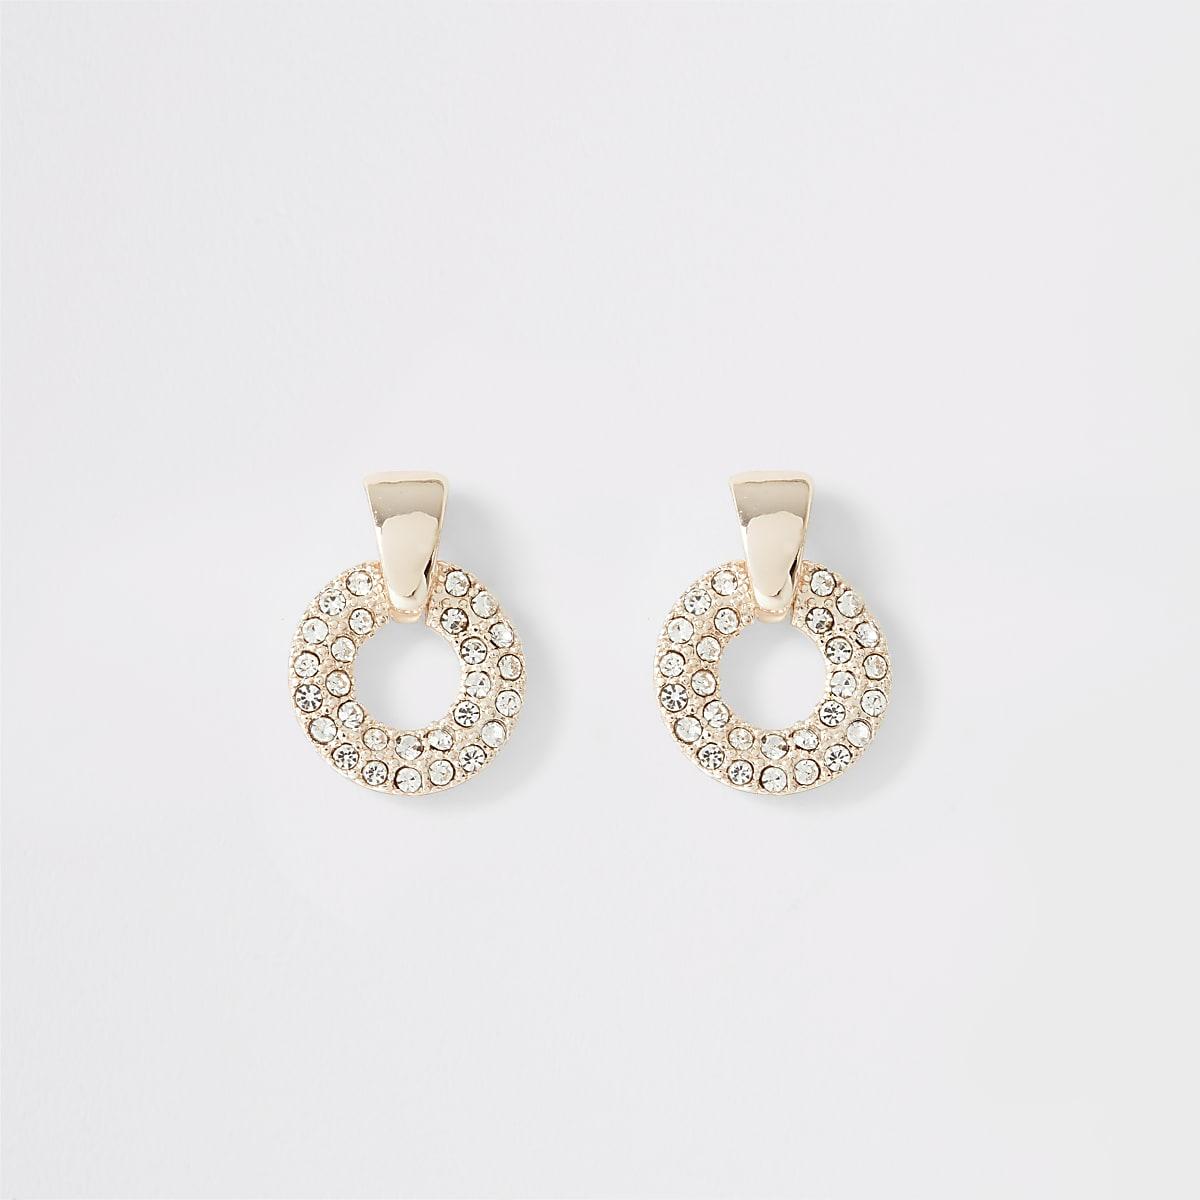 Rose gold rhinestone paved ring stud earrings